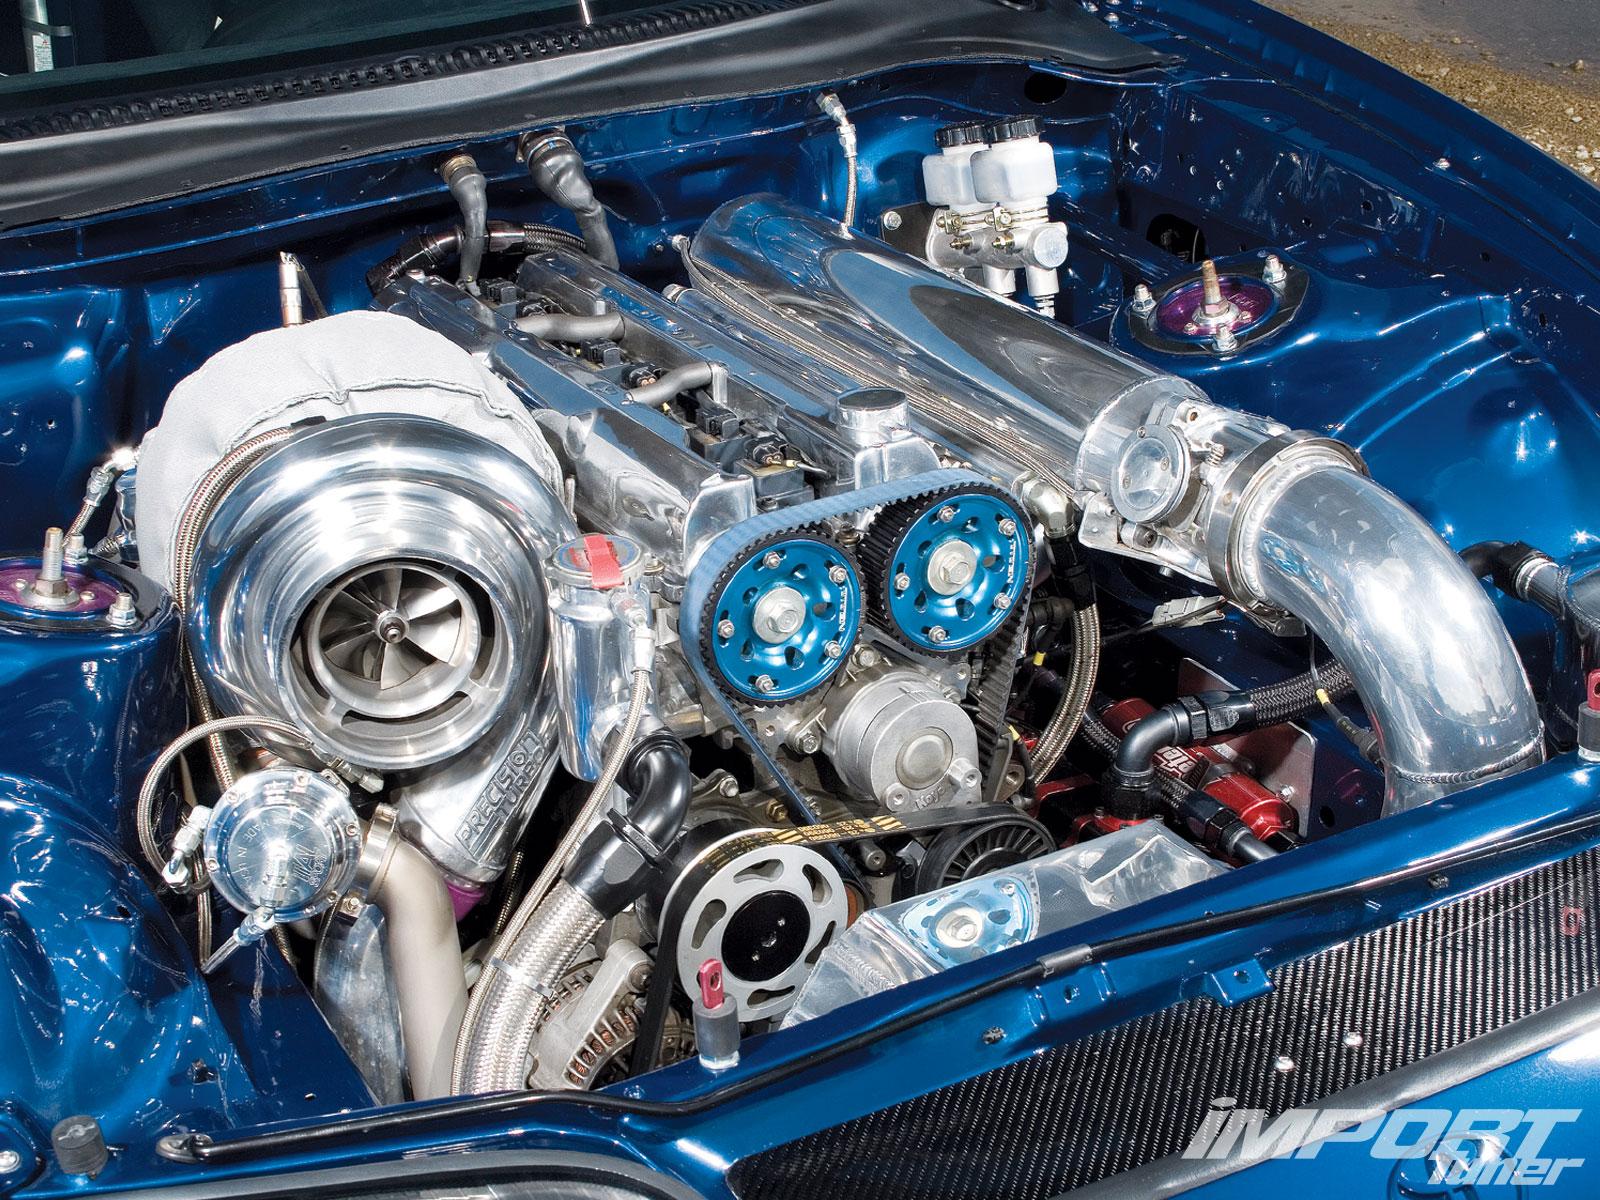 Impp O B Toyota Supra Bengine View on 2003 Toyota Corolla Engine Diagram